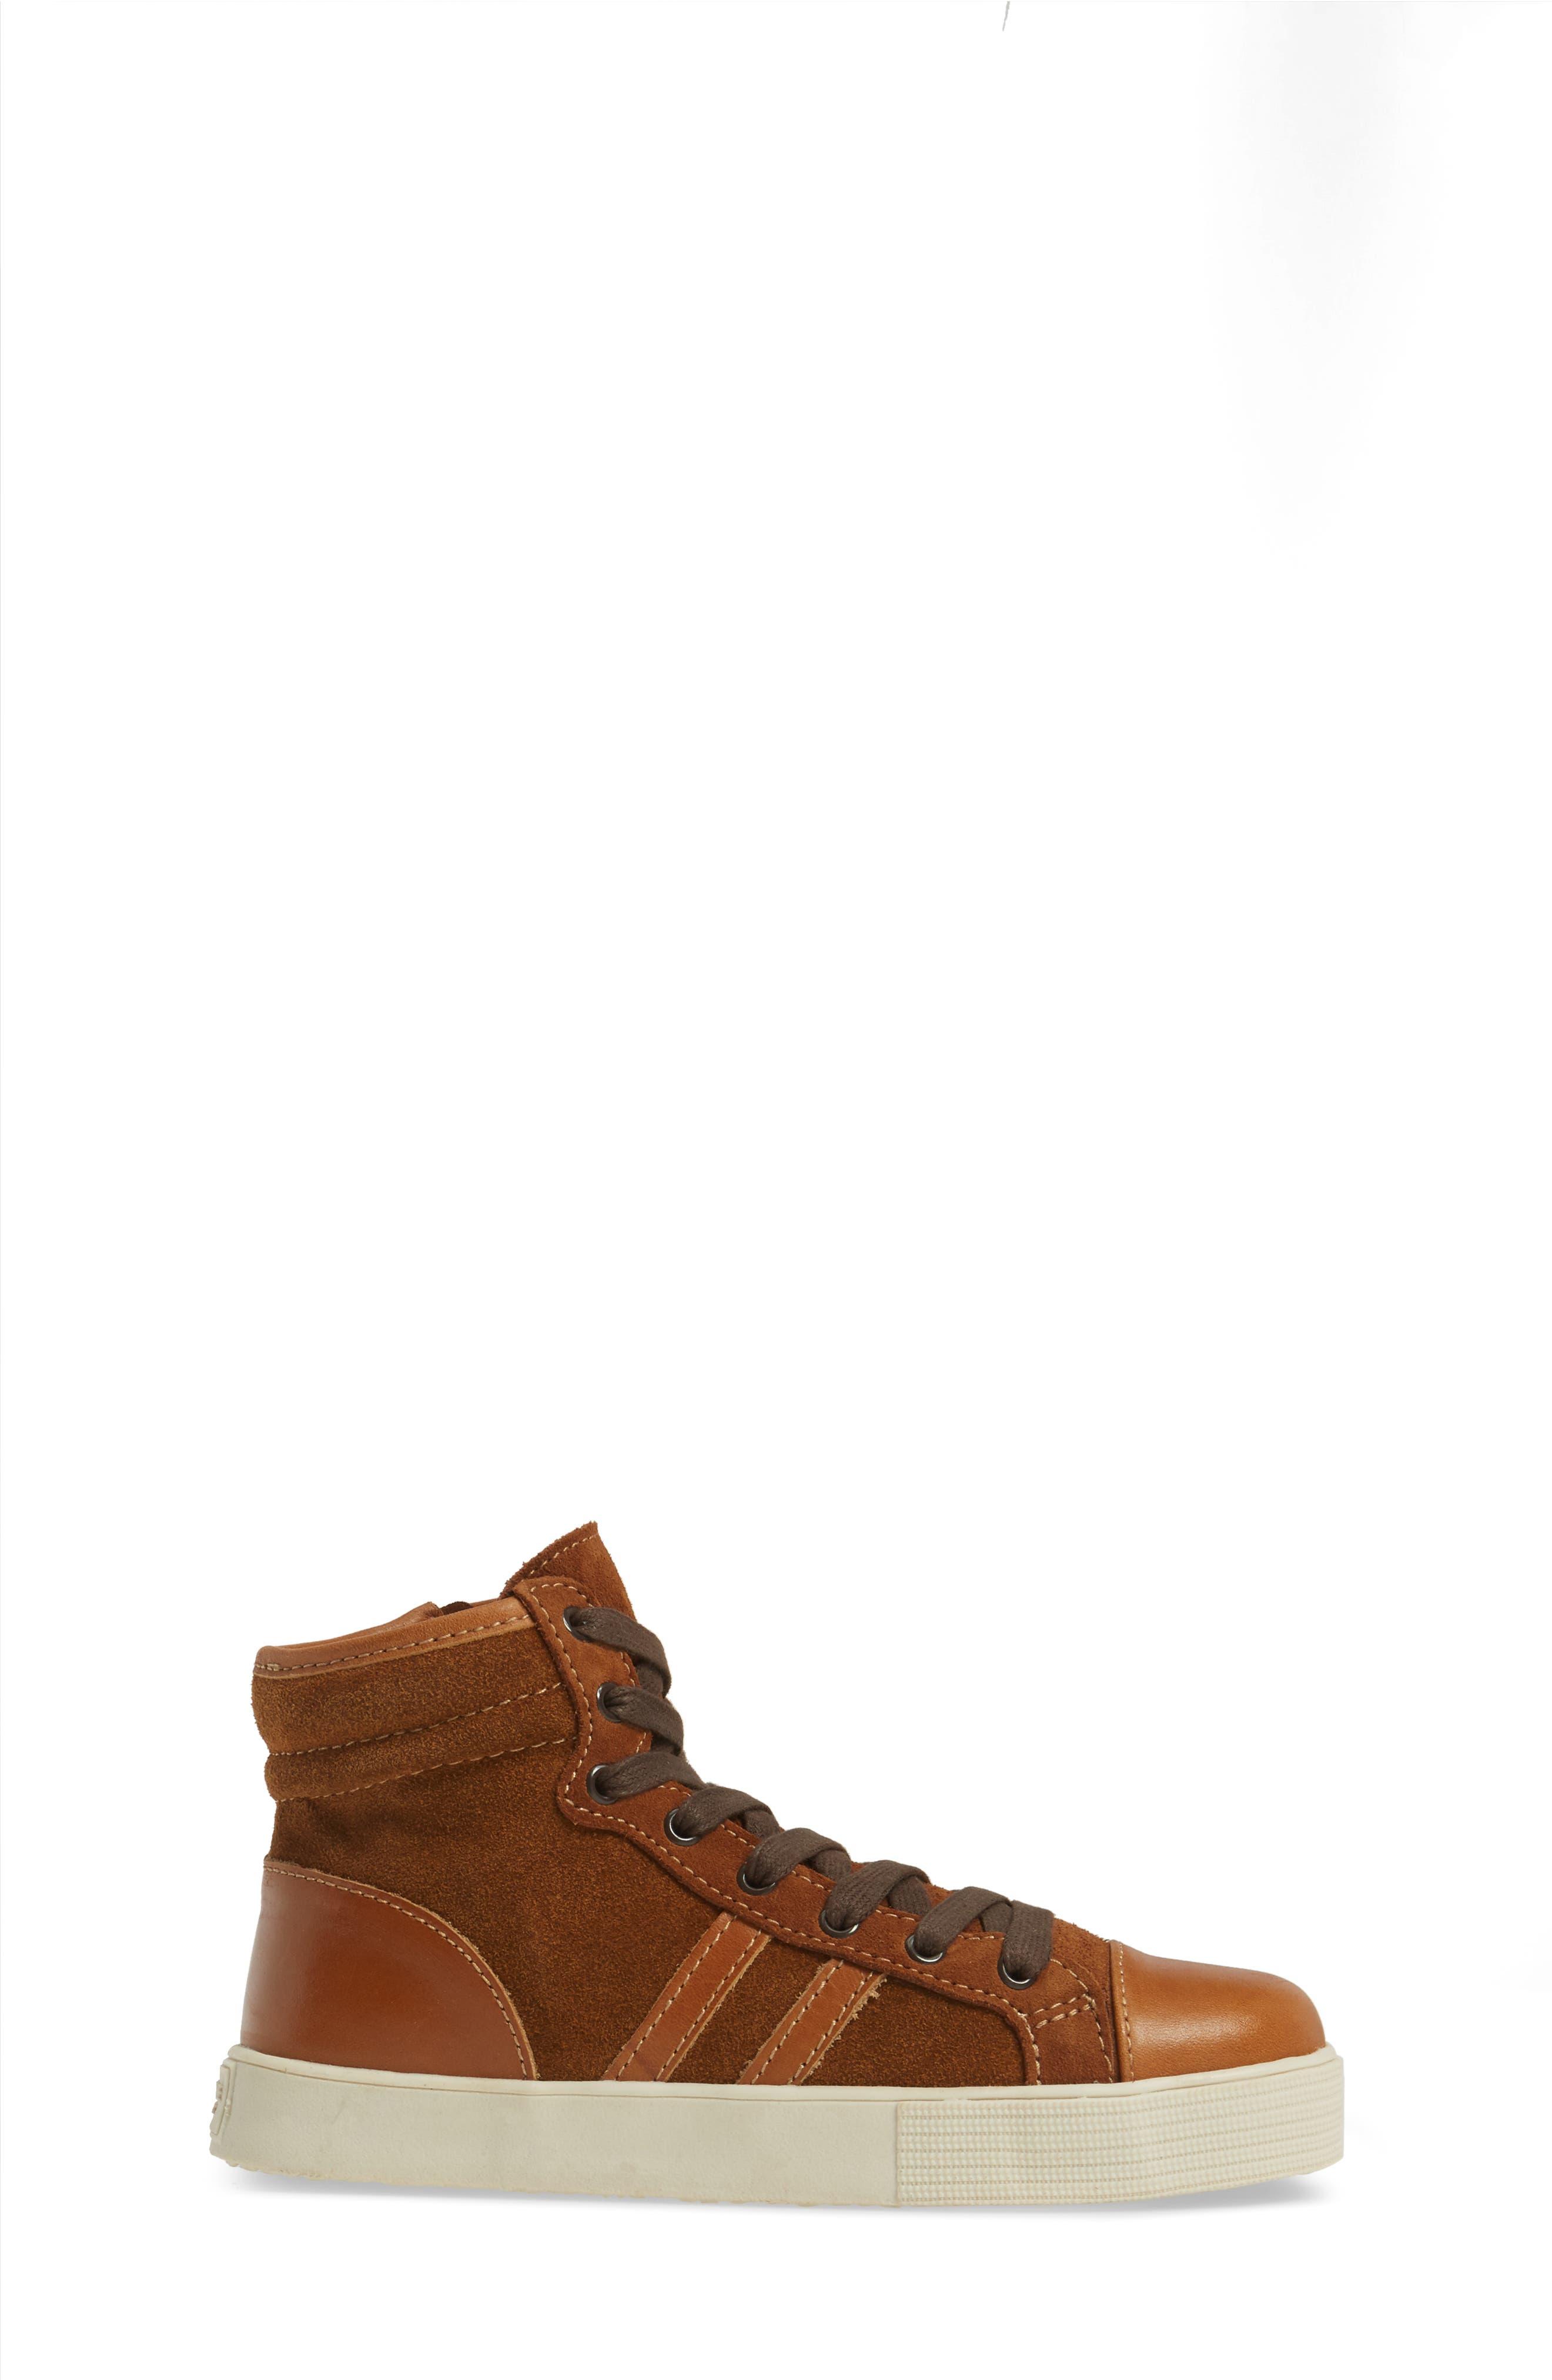 Jay Top High-Top Zip Sneaker,                             Alternate thumbnail 3, color,                             205